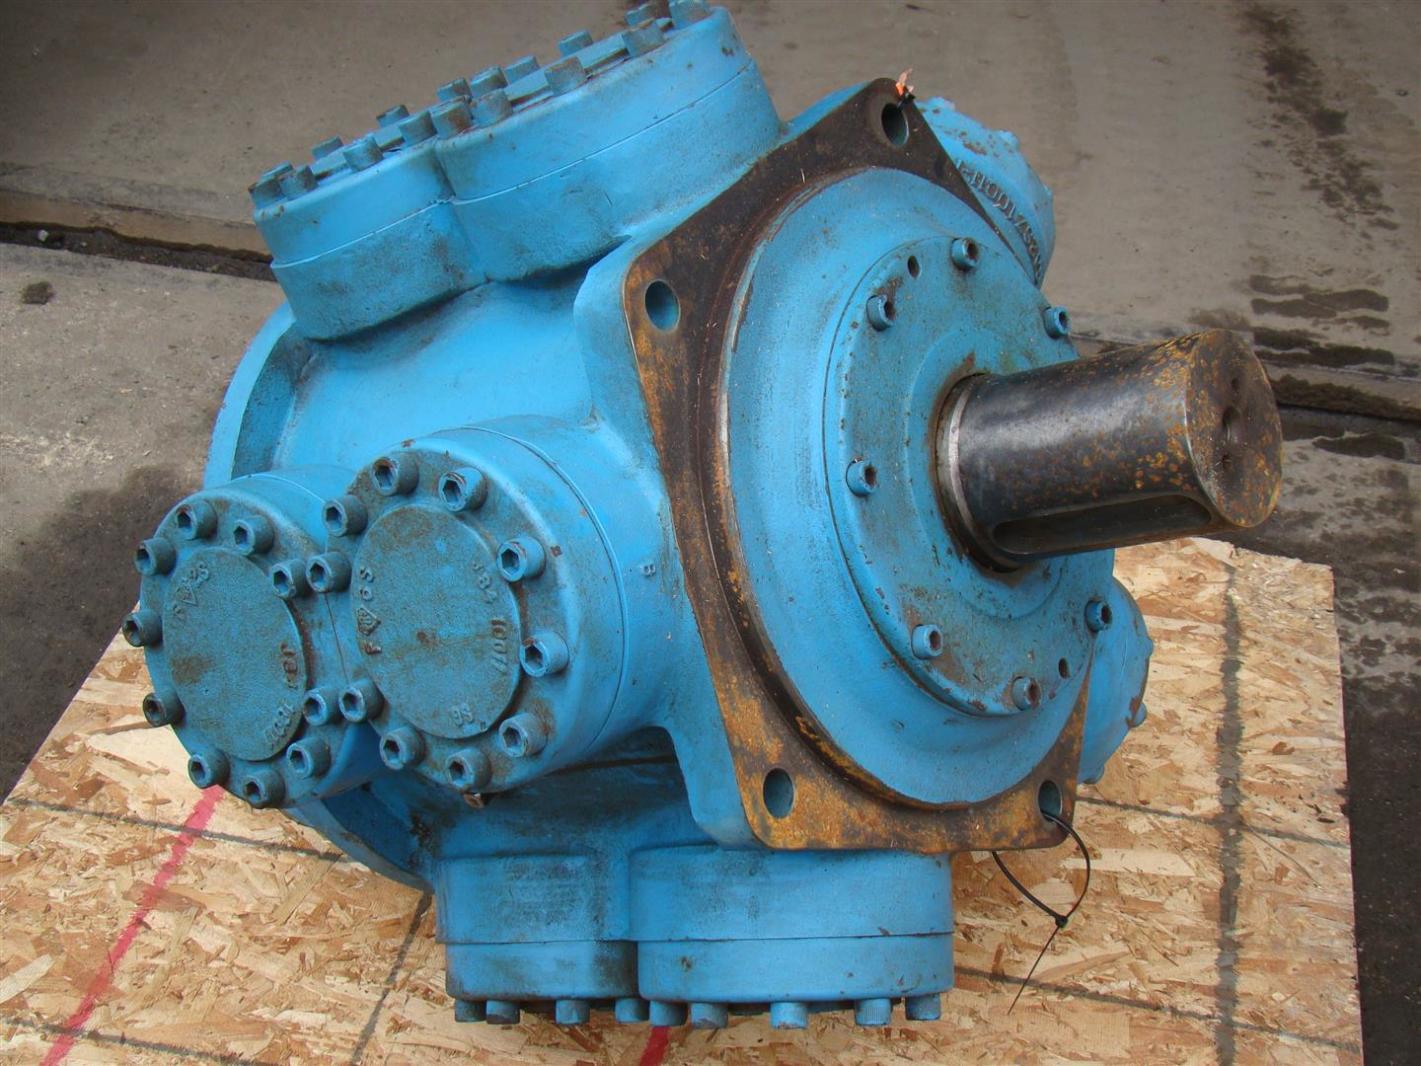 Rotary power hydraulic radial piston motor 4 1 2 shaft 60 Radial piston hydraulic motor